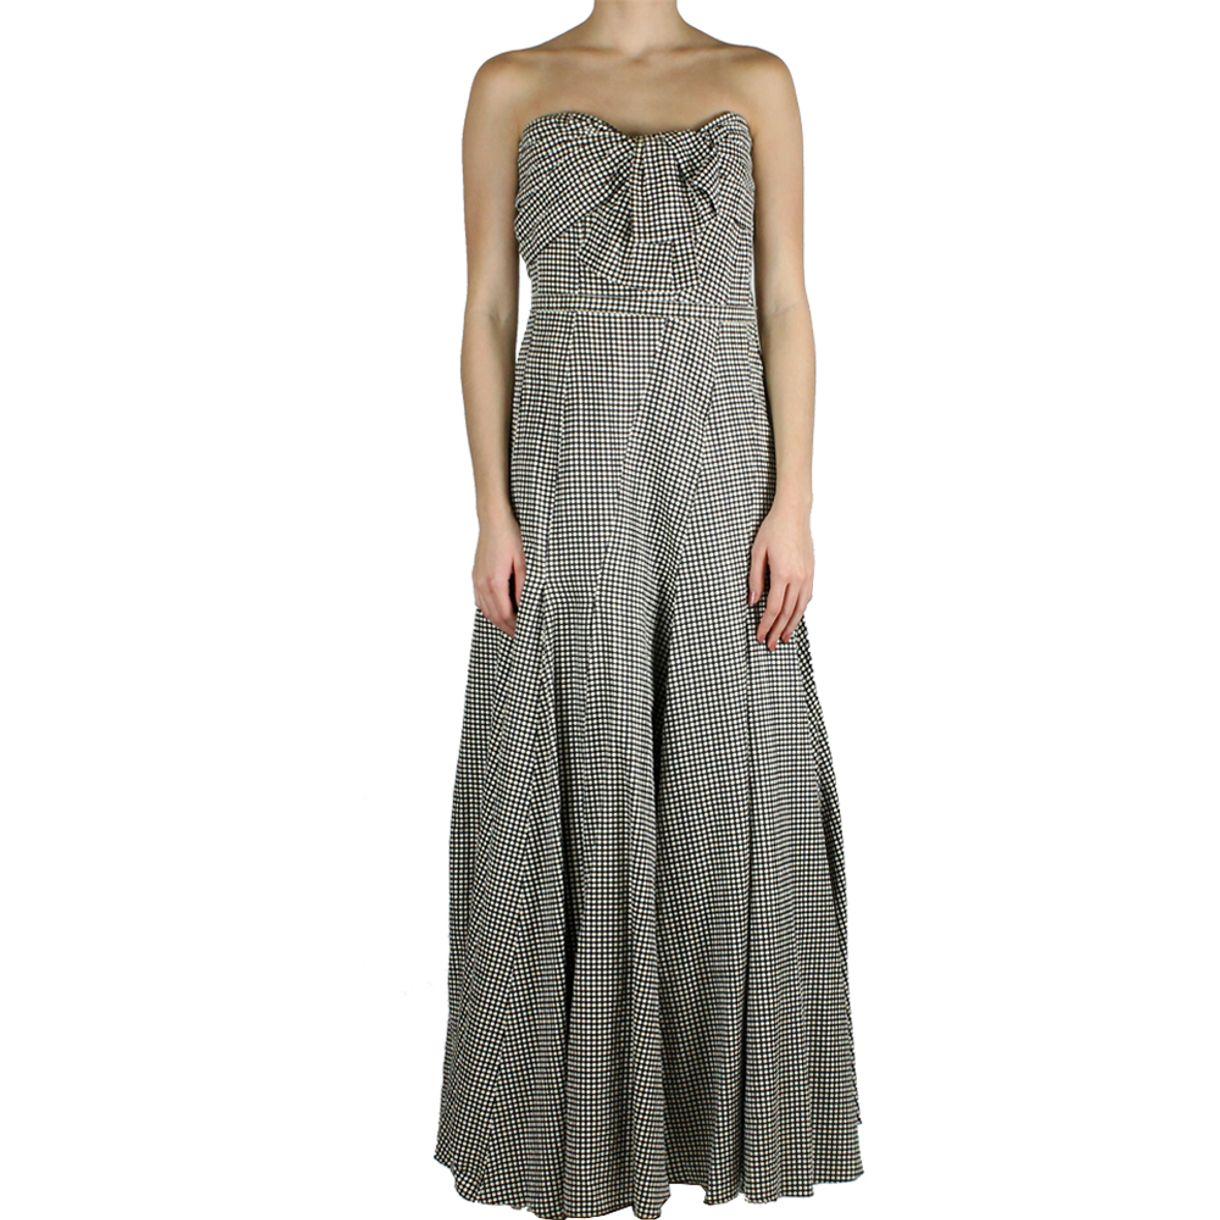 8408-vestido-lanvin-dots-1